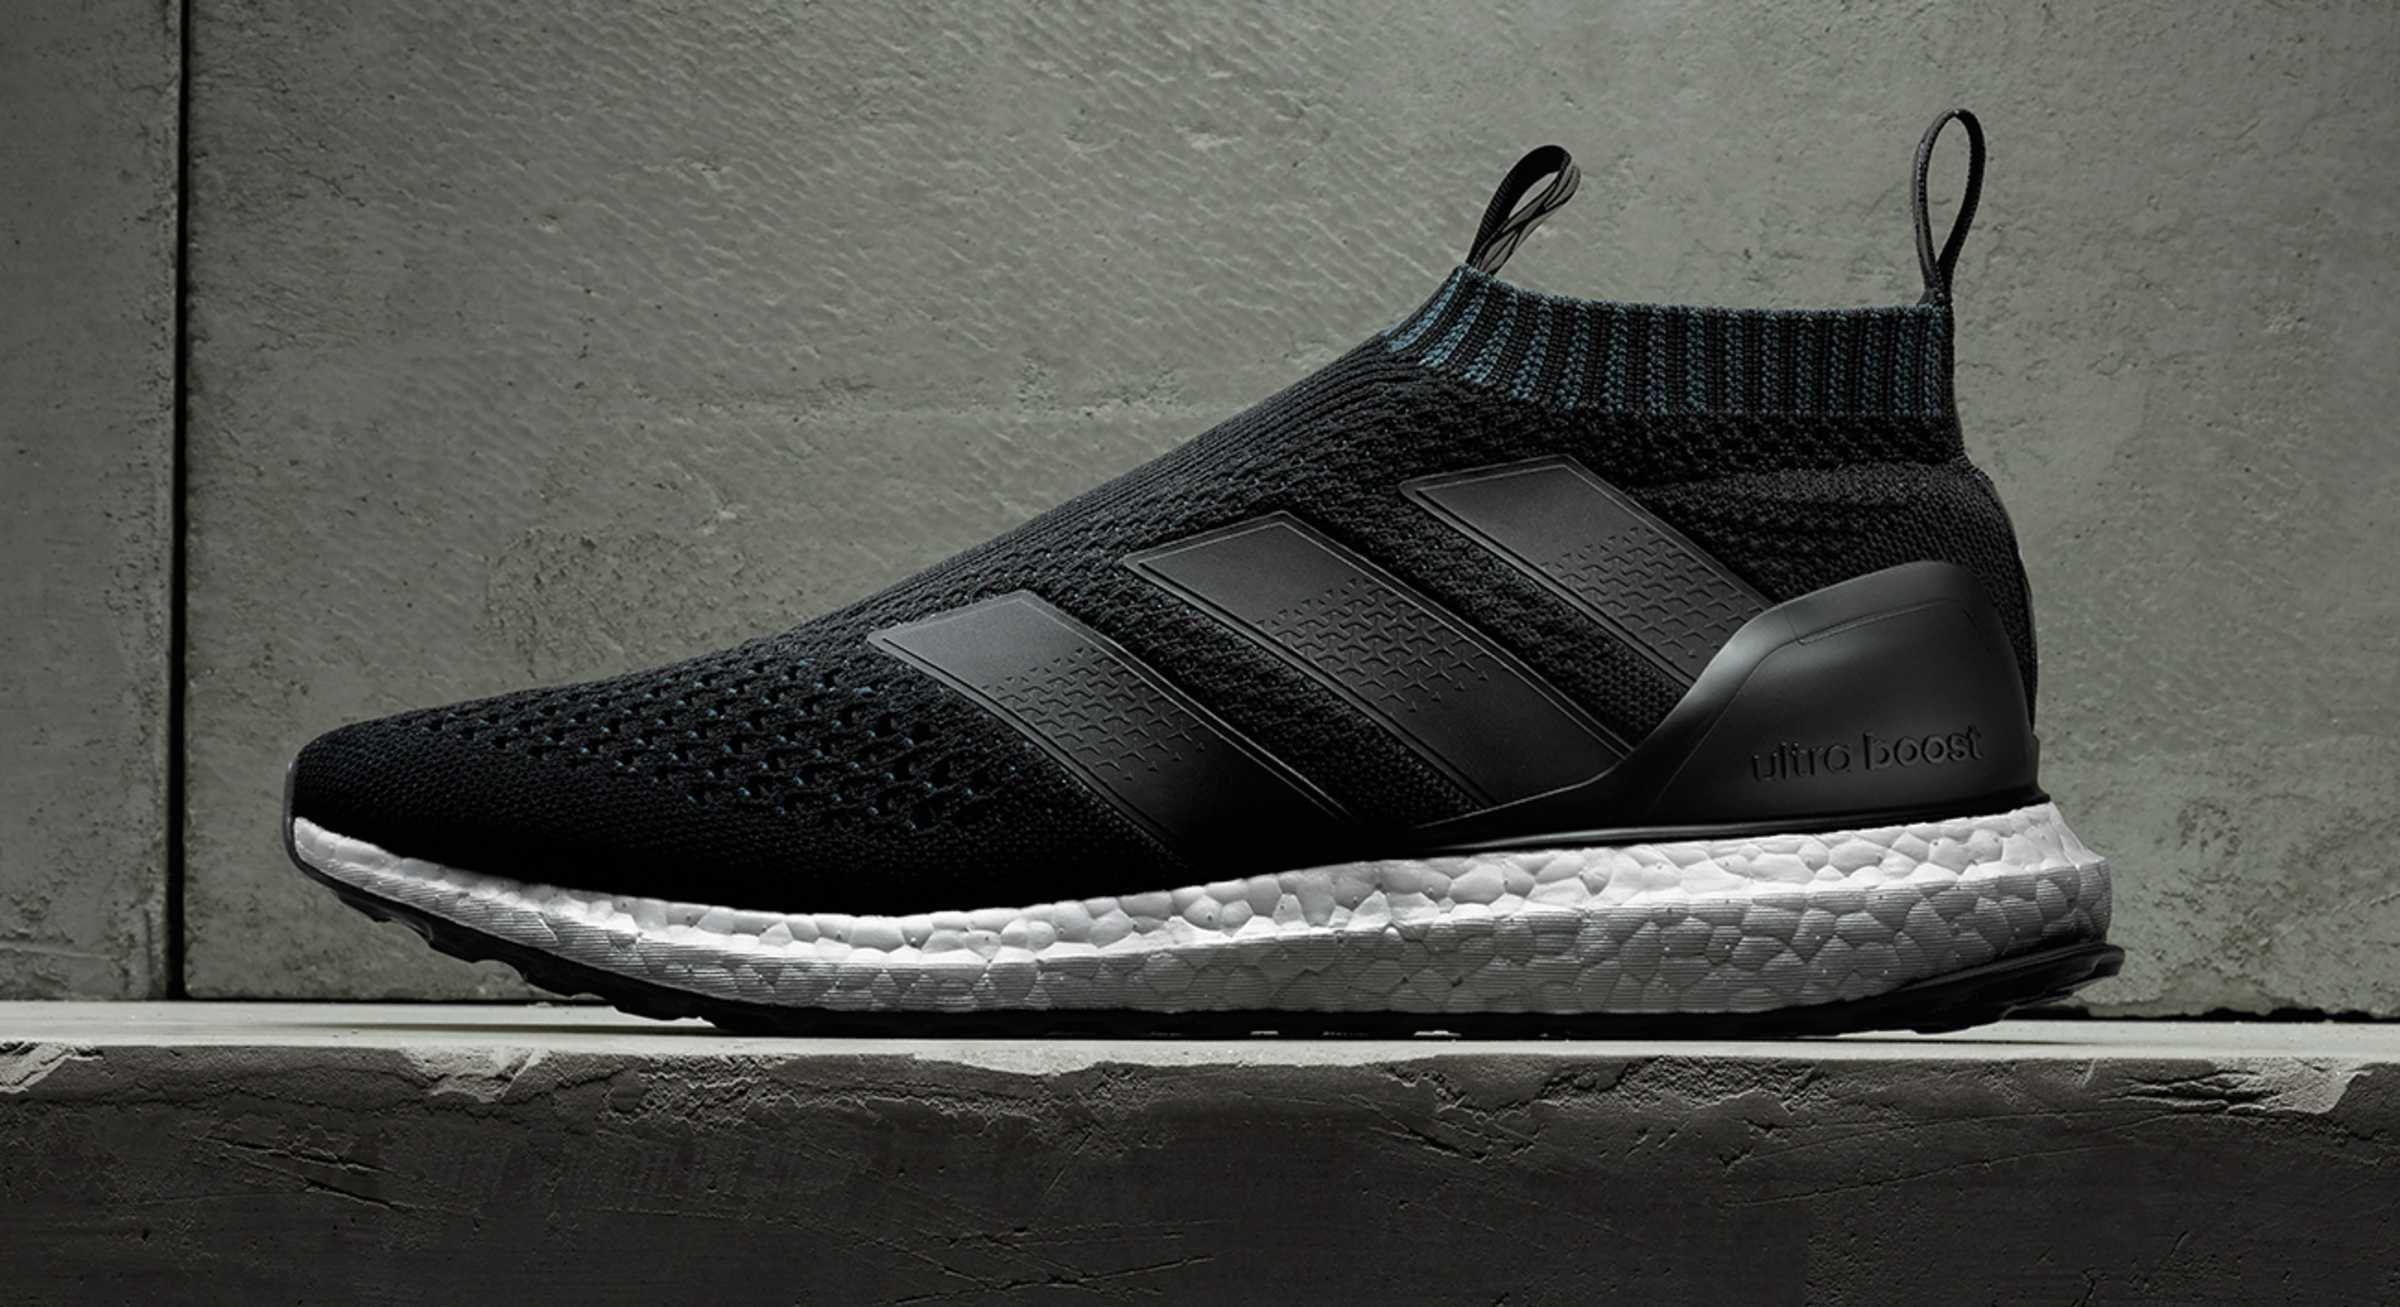 Adidas Brings Soccer Style To The Street With The Ace16 Purecontrol Ultraboost En 2020 Zapatos De Futbol Calzado Hombre Zapatos De Tacones